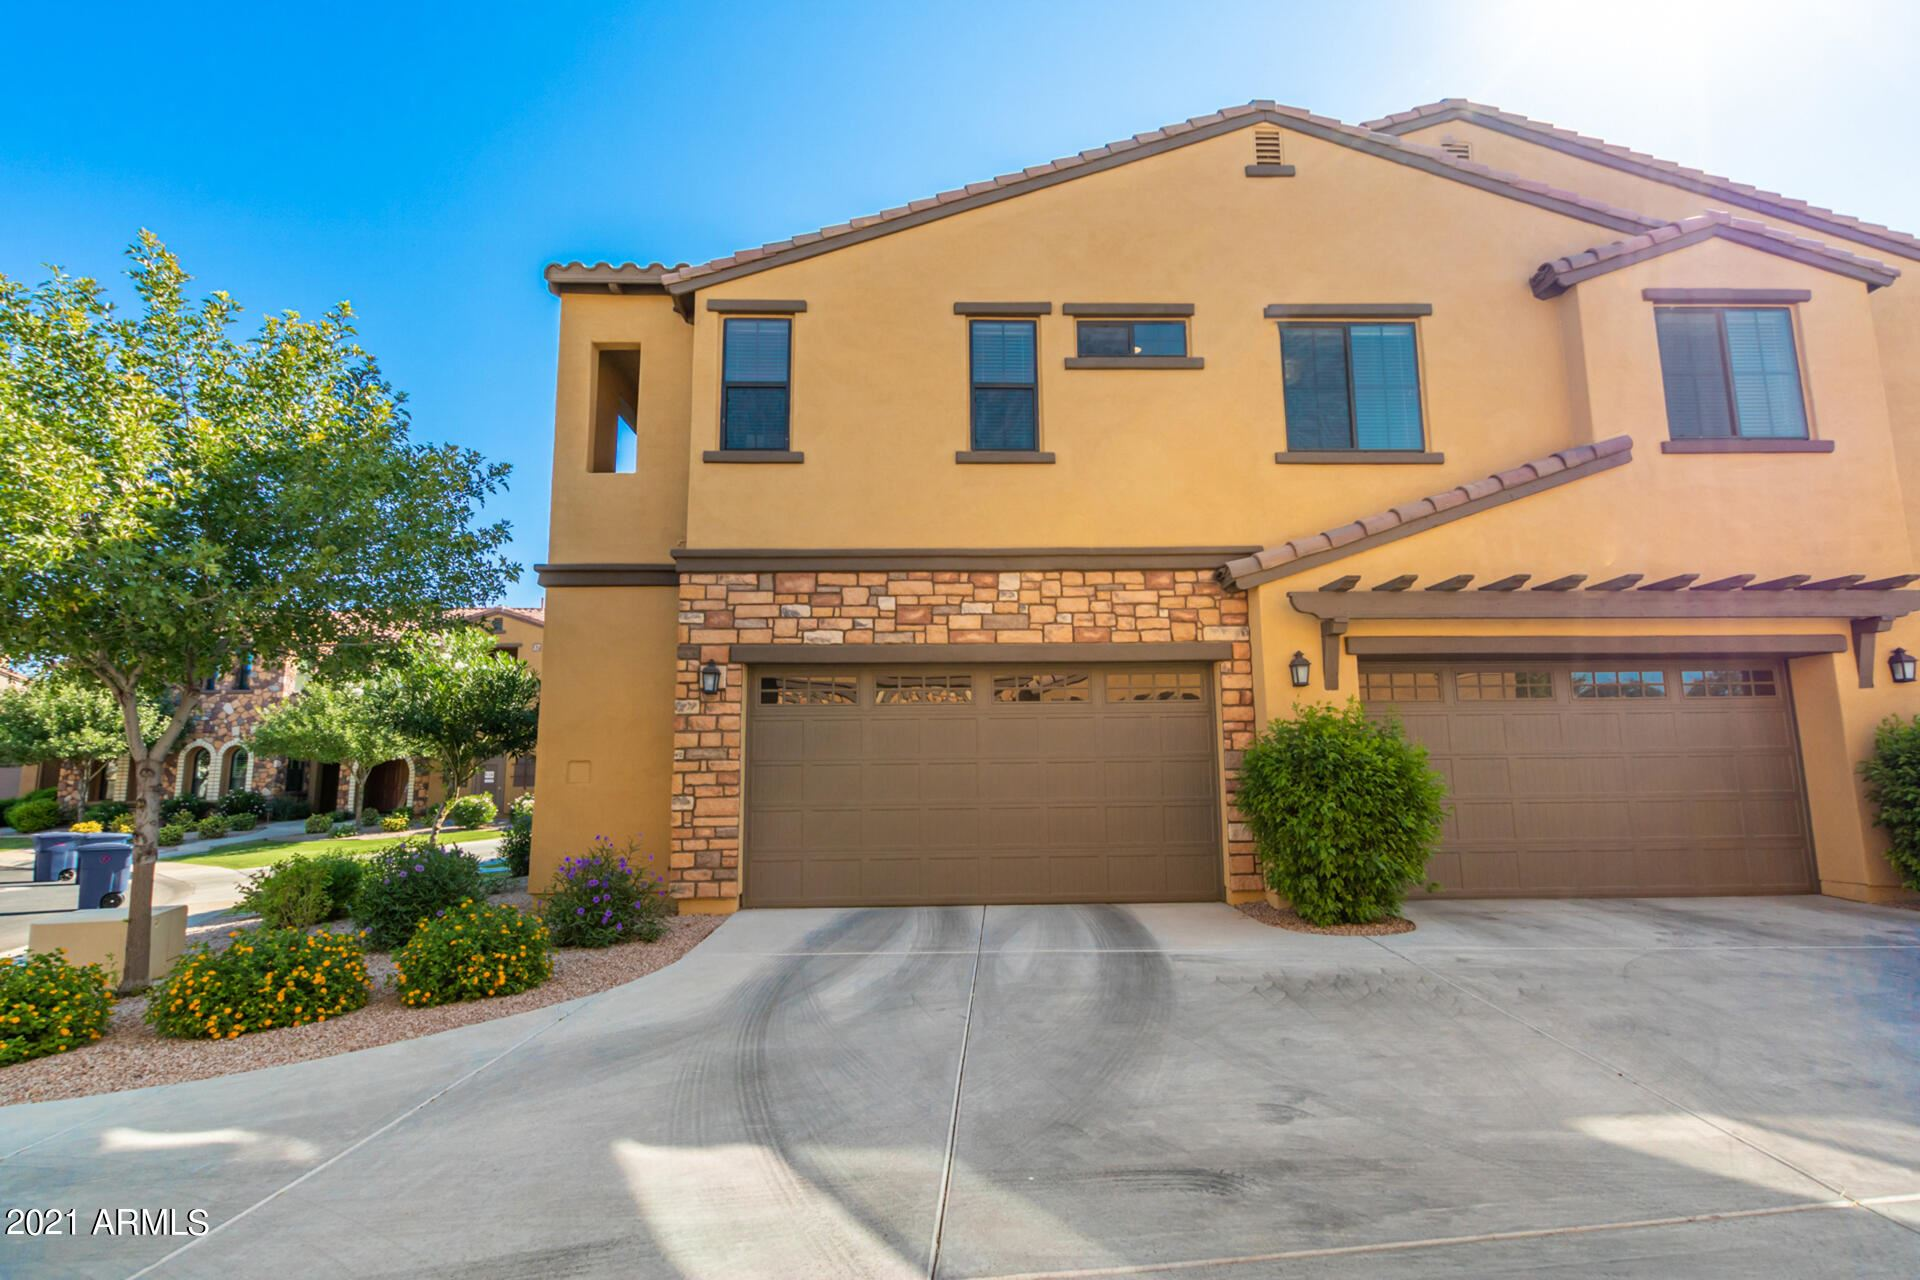 Photo of 4777 S FULTON RANCH Boulevard #2052, Chandler, AZ 85248 (MLS # 6310916)